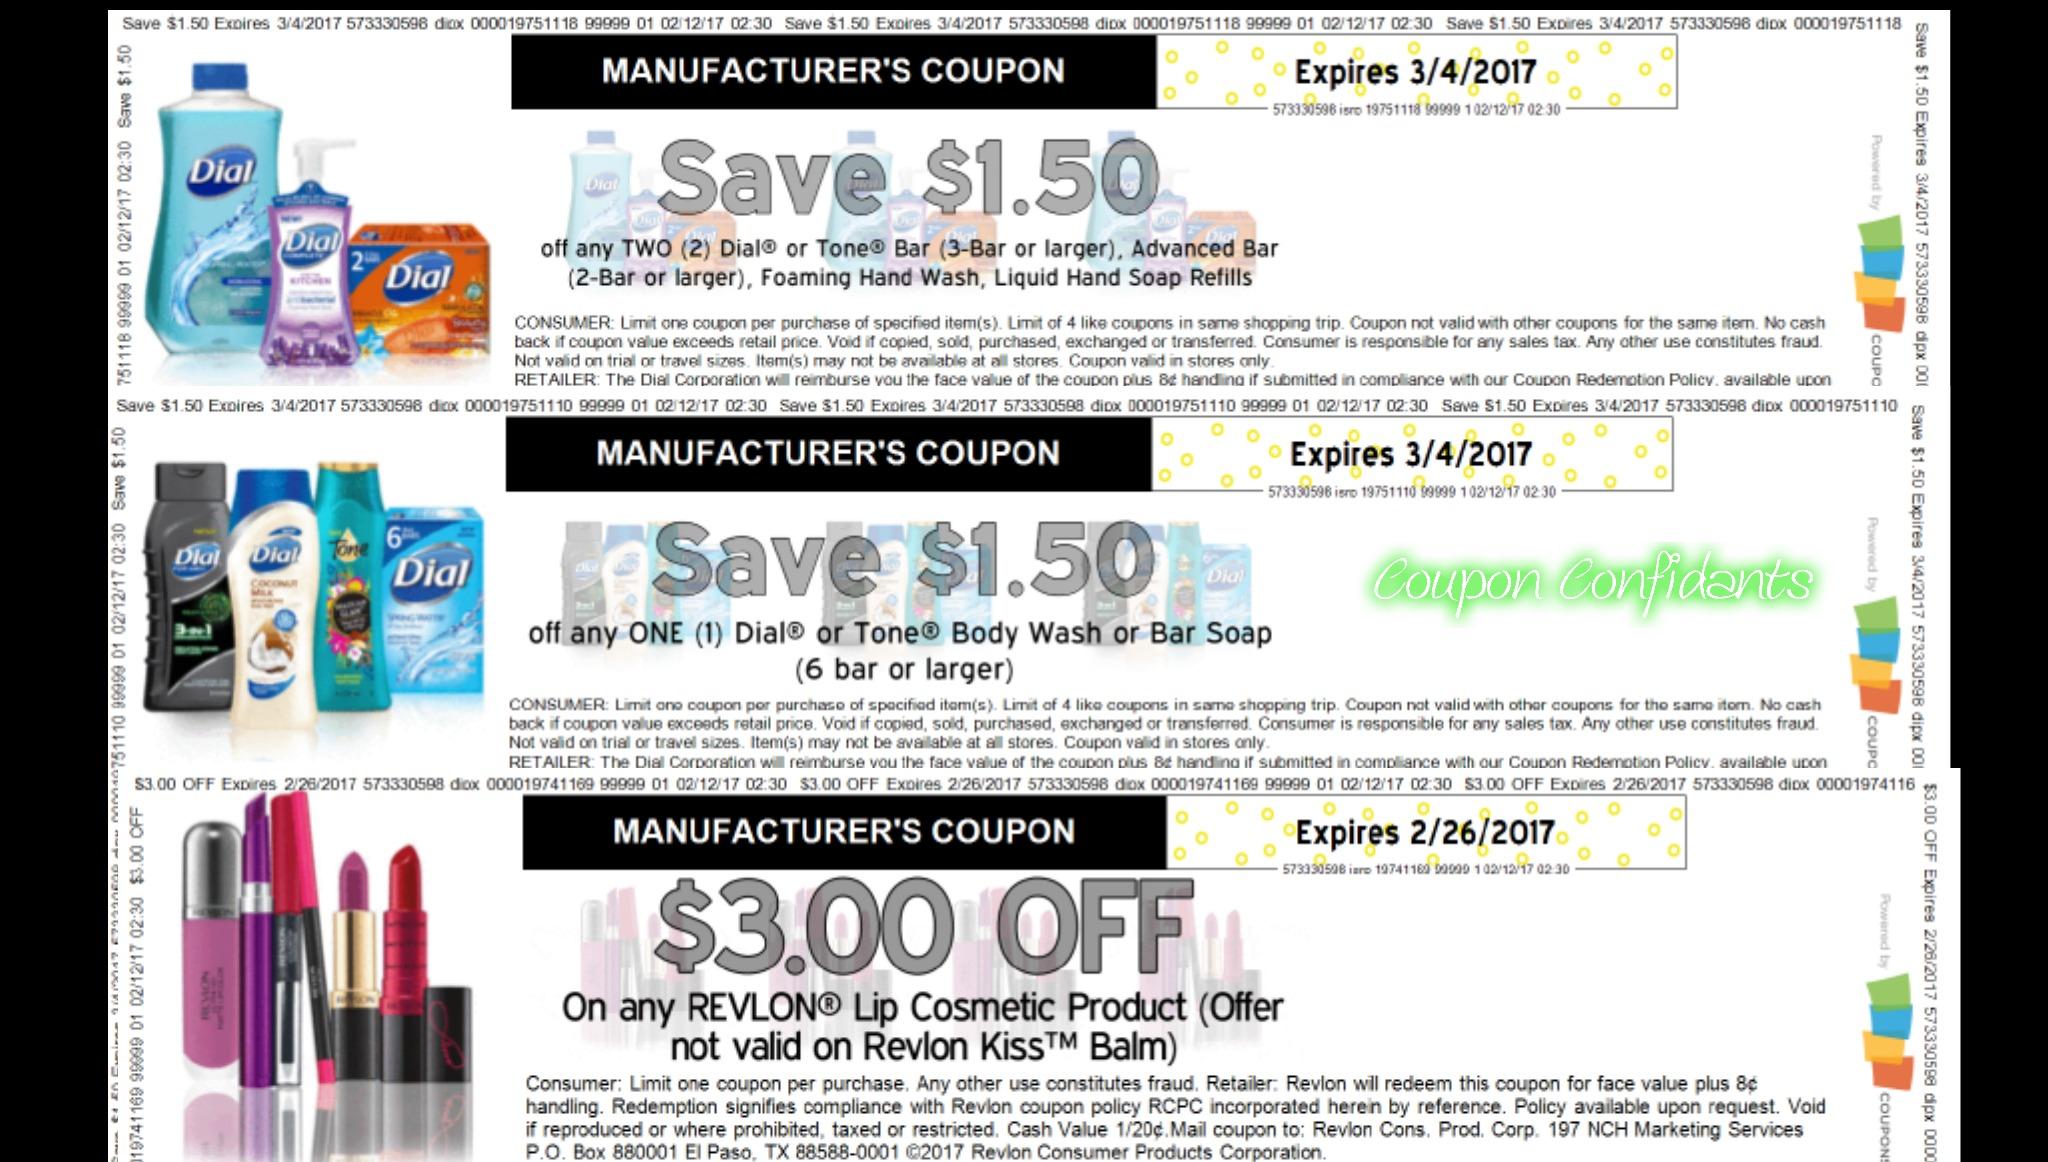 Hot coupons